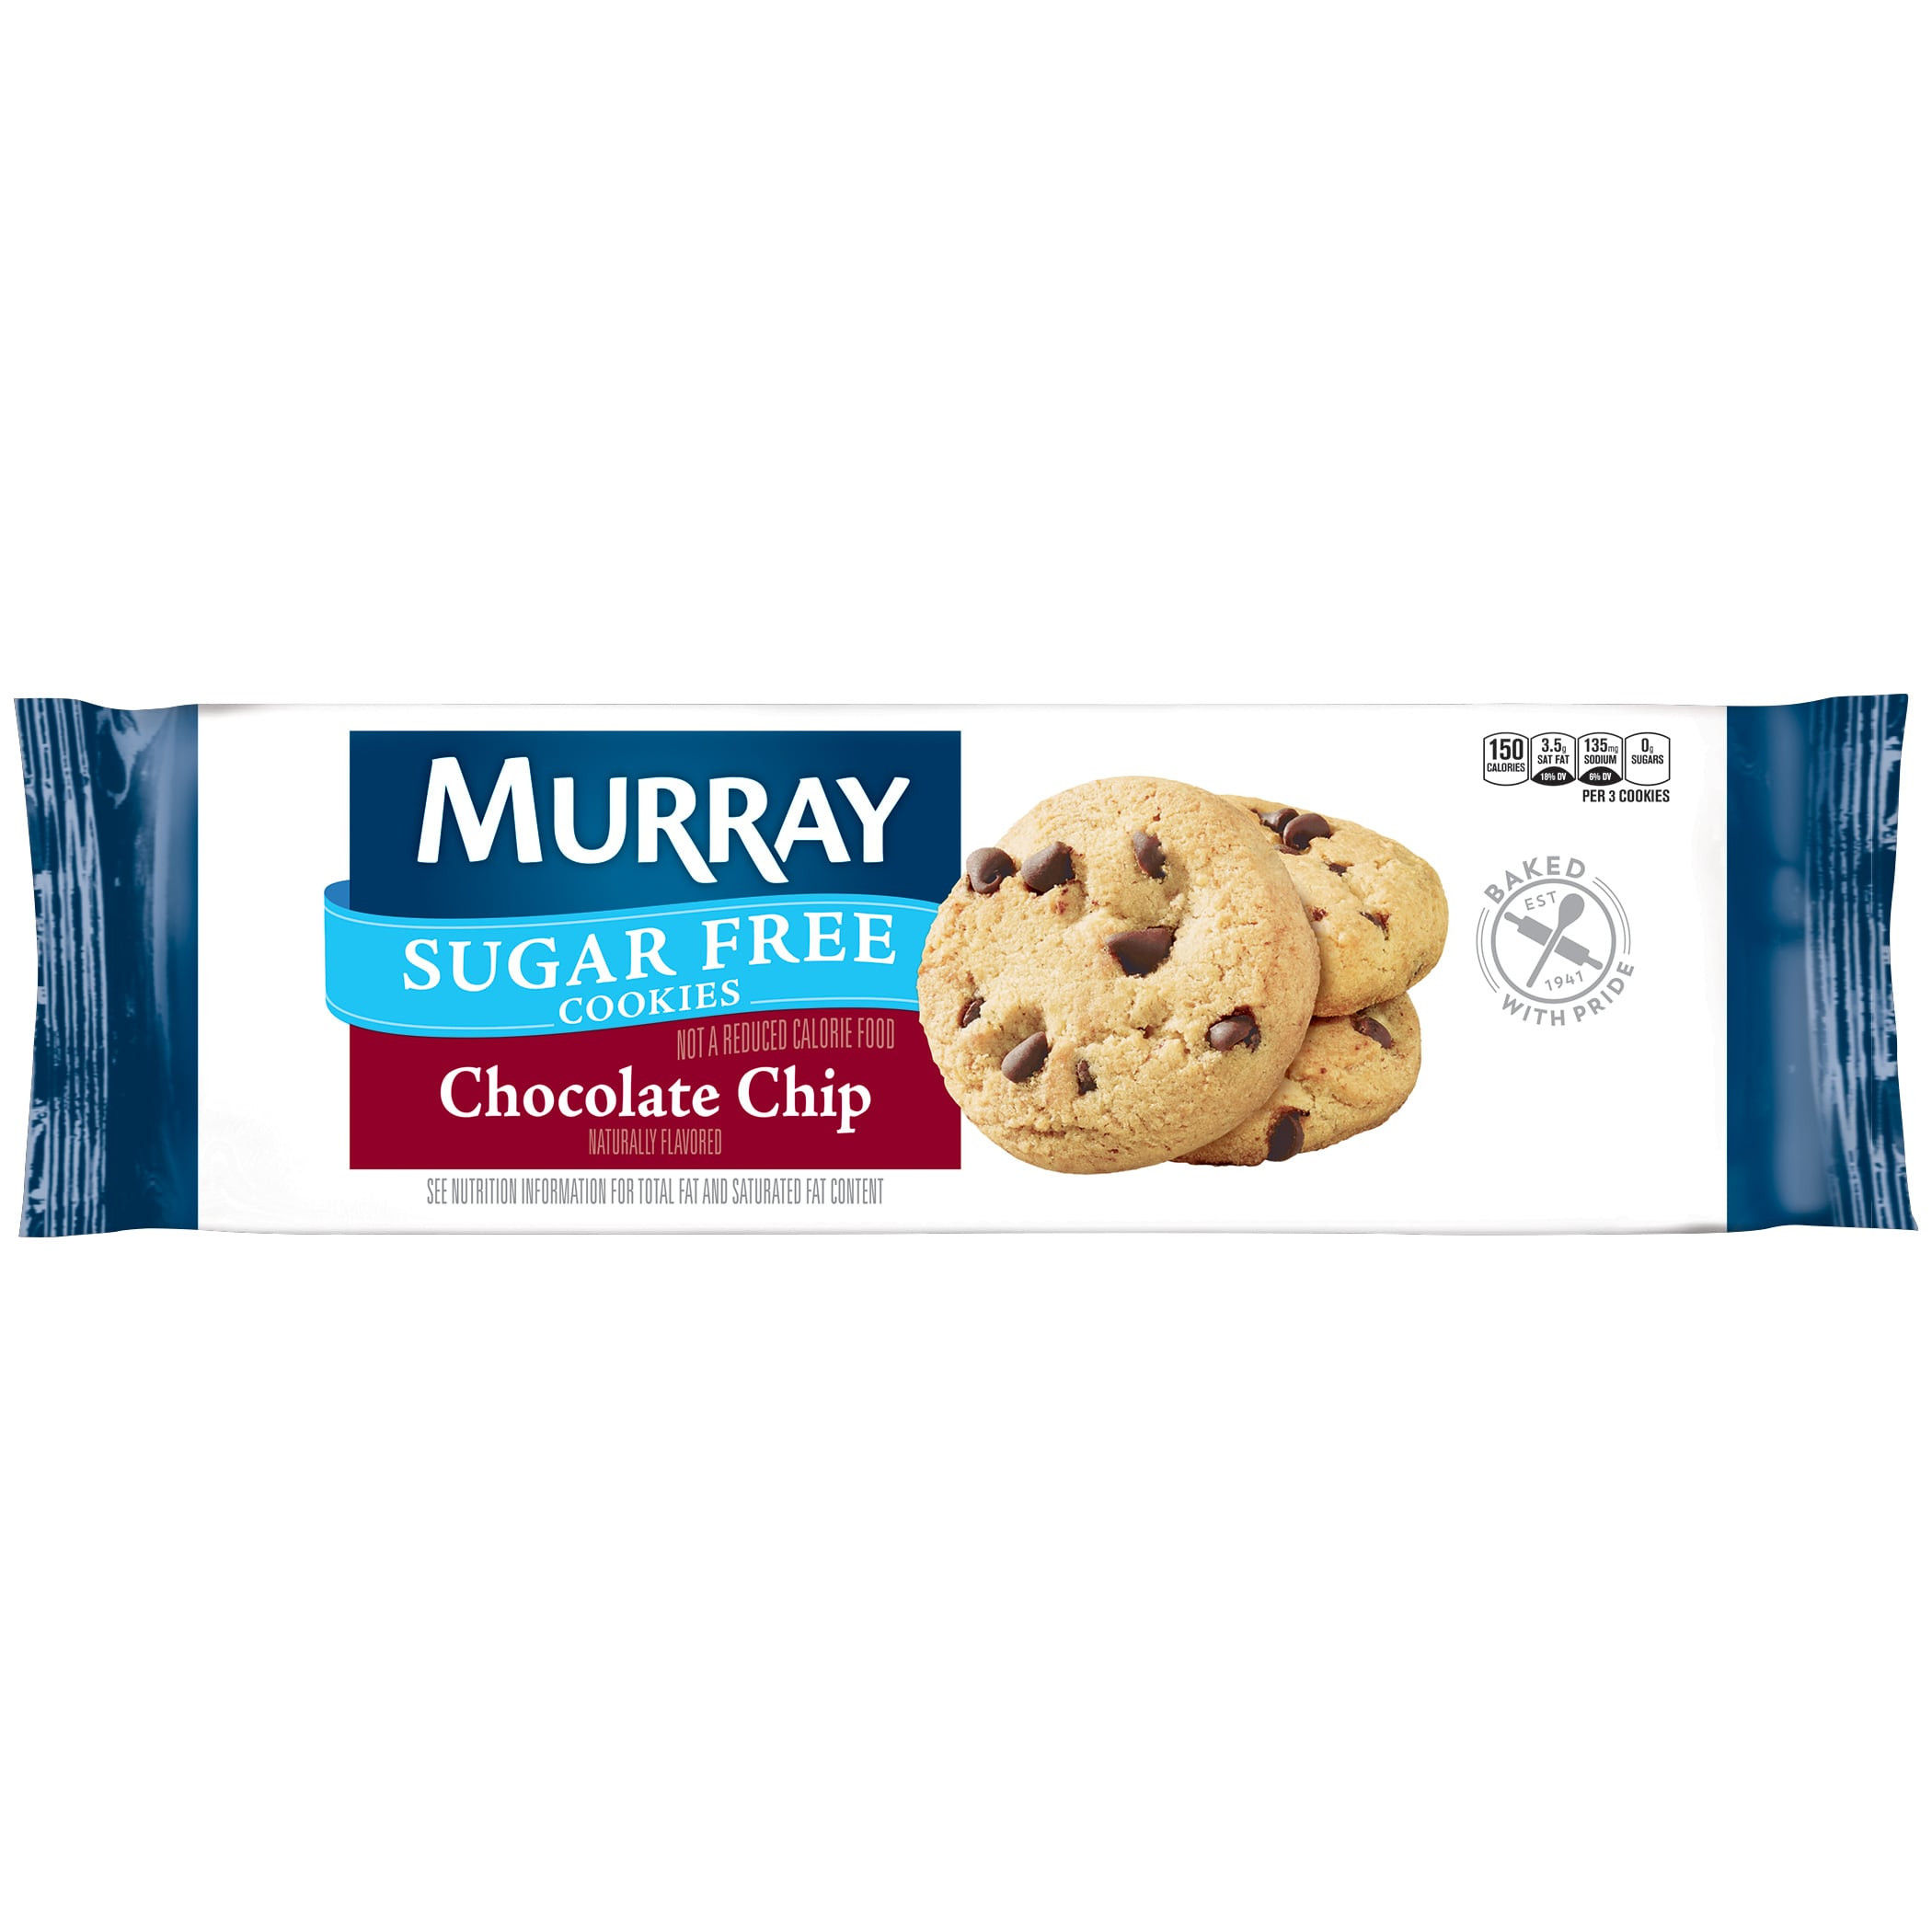 Murray Sugar Free Cookies  Murray Sugar Free Chocolate Chip cookies